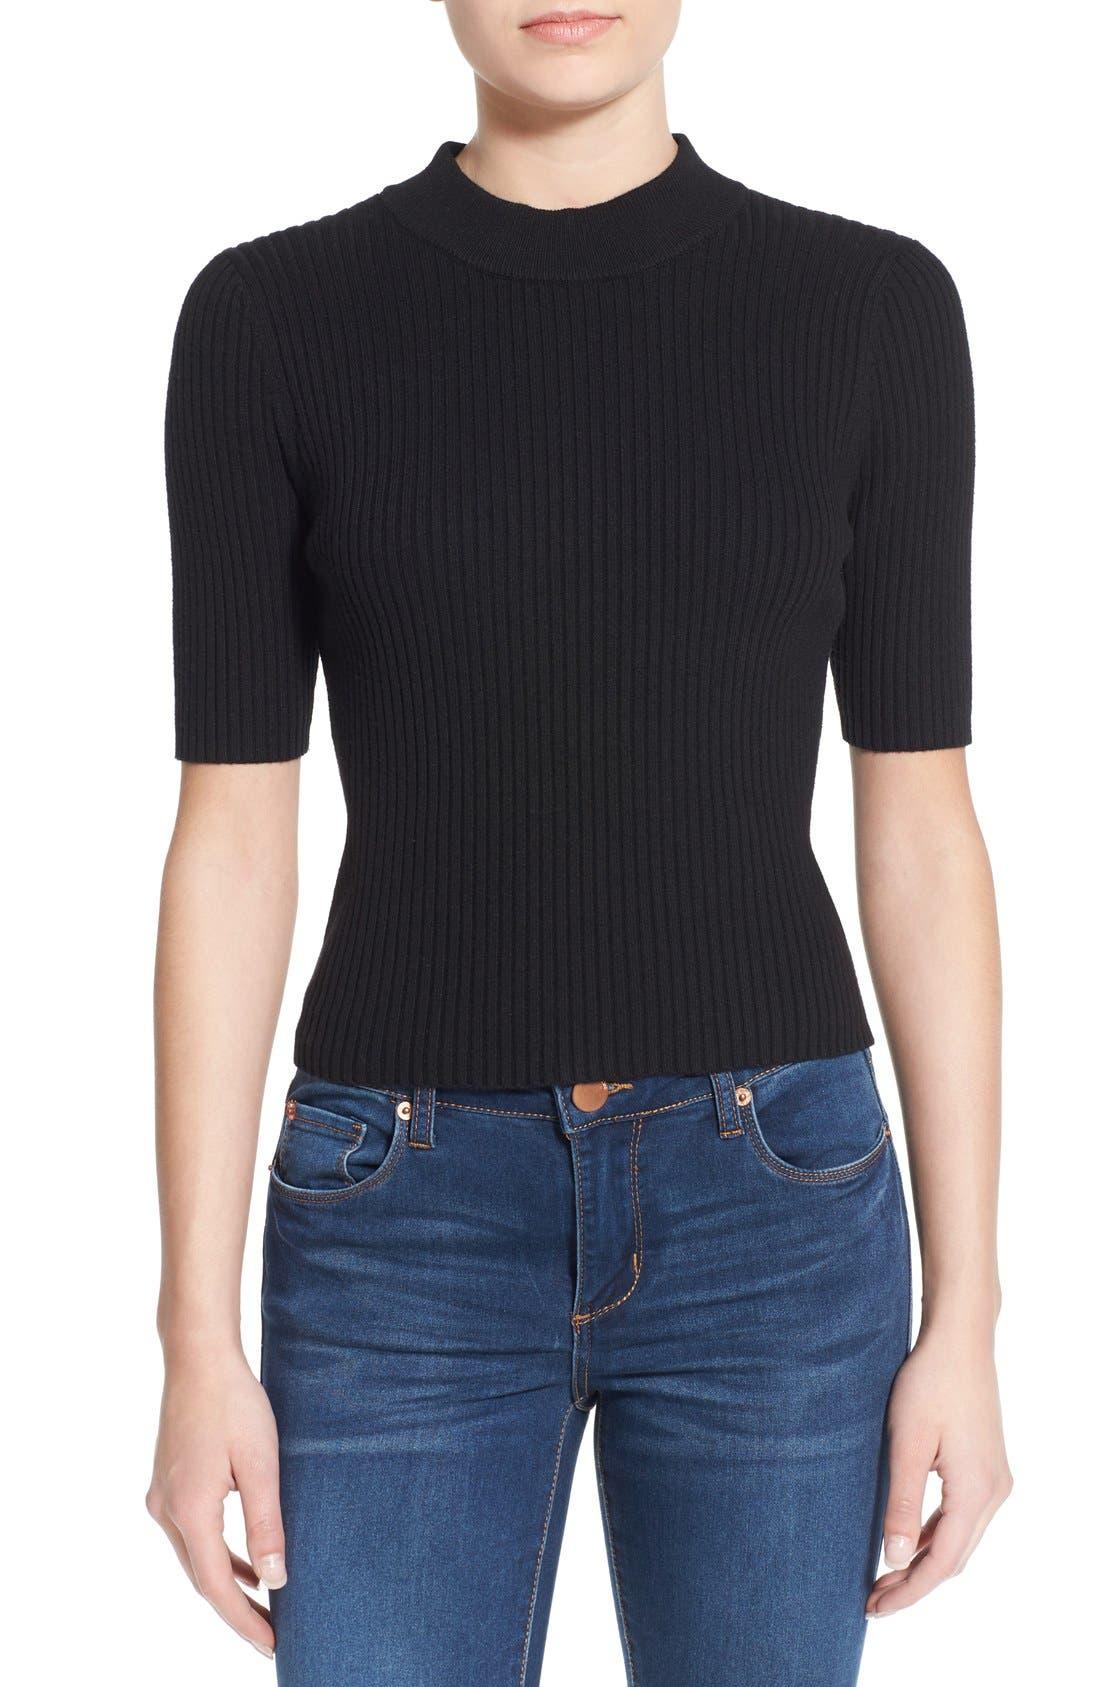 Alternate Image 1 Selected - BP. Short Sleeve Rib Knit Pullover